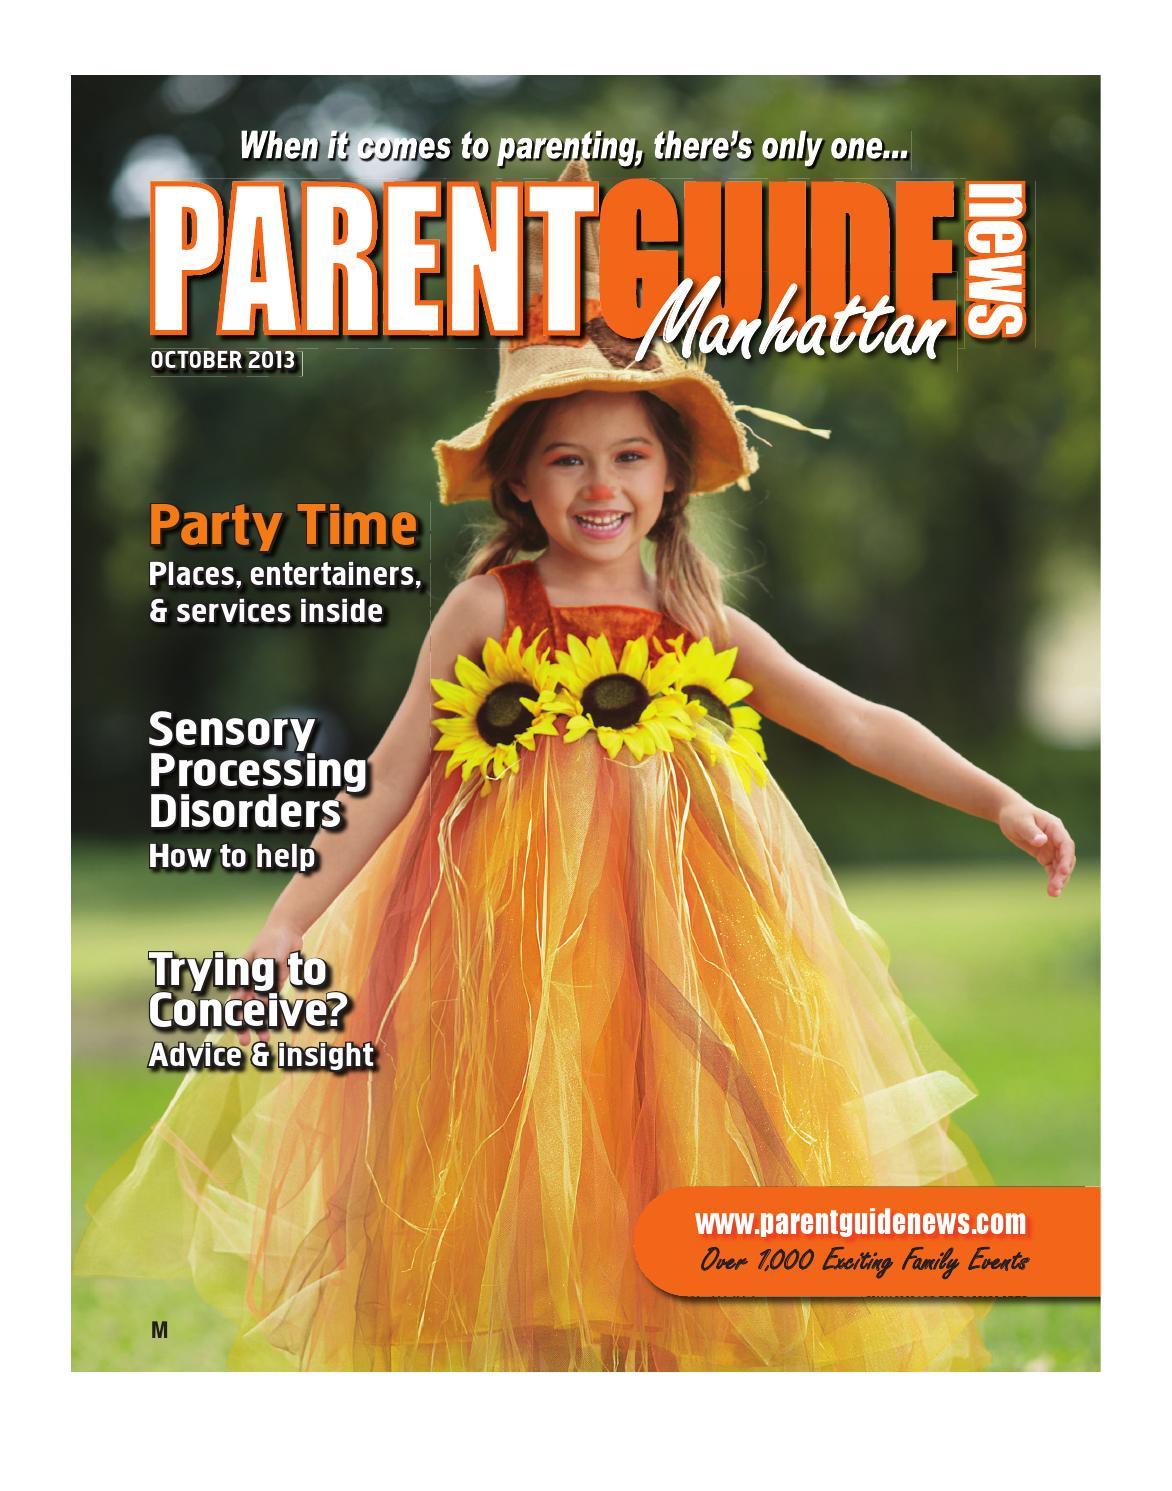 PARENTGUIDE News October 2013 - Manhattan Edition by PARENTGUIDE News -  issuu